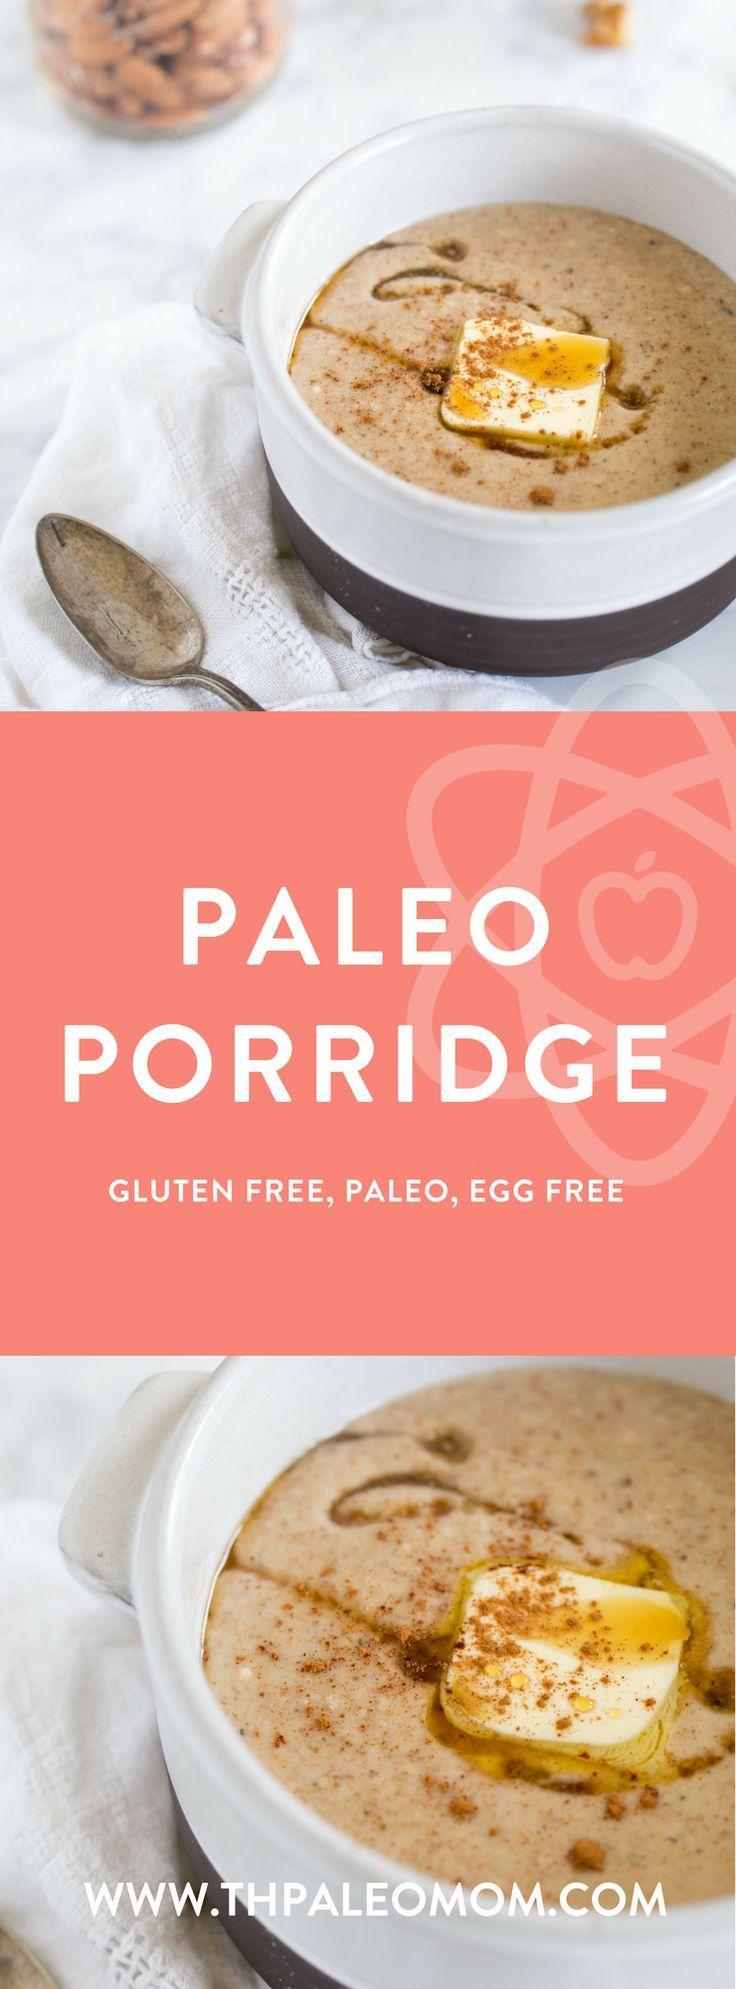 Paleo Porridge | The Paleo Mom